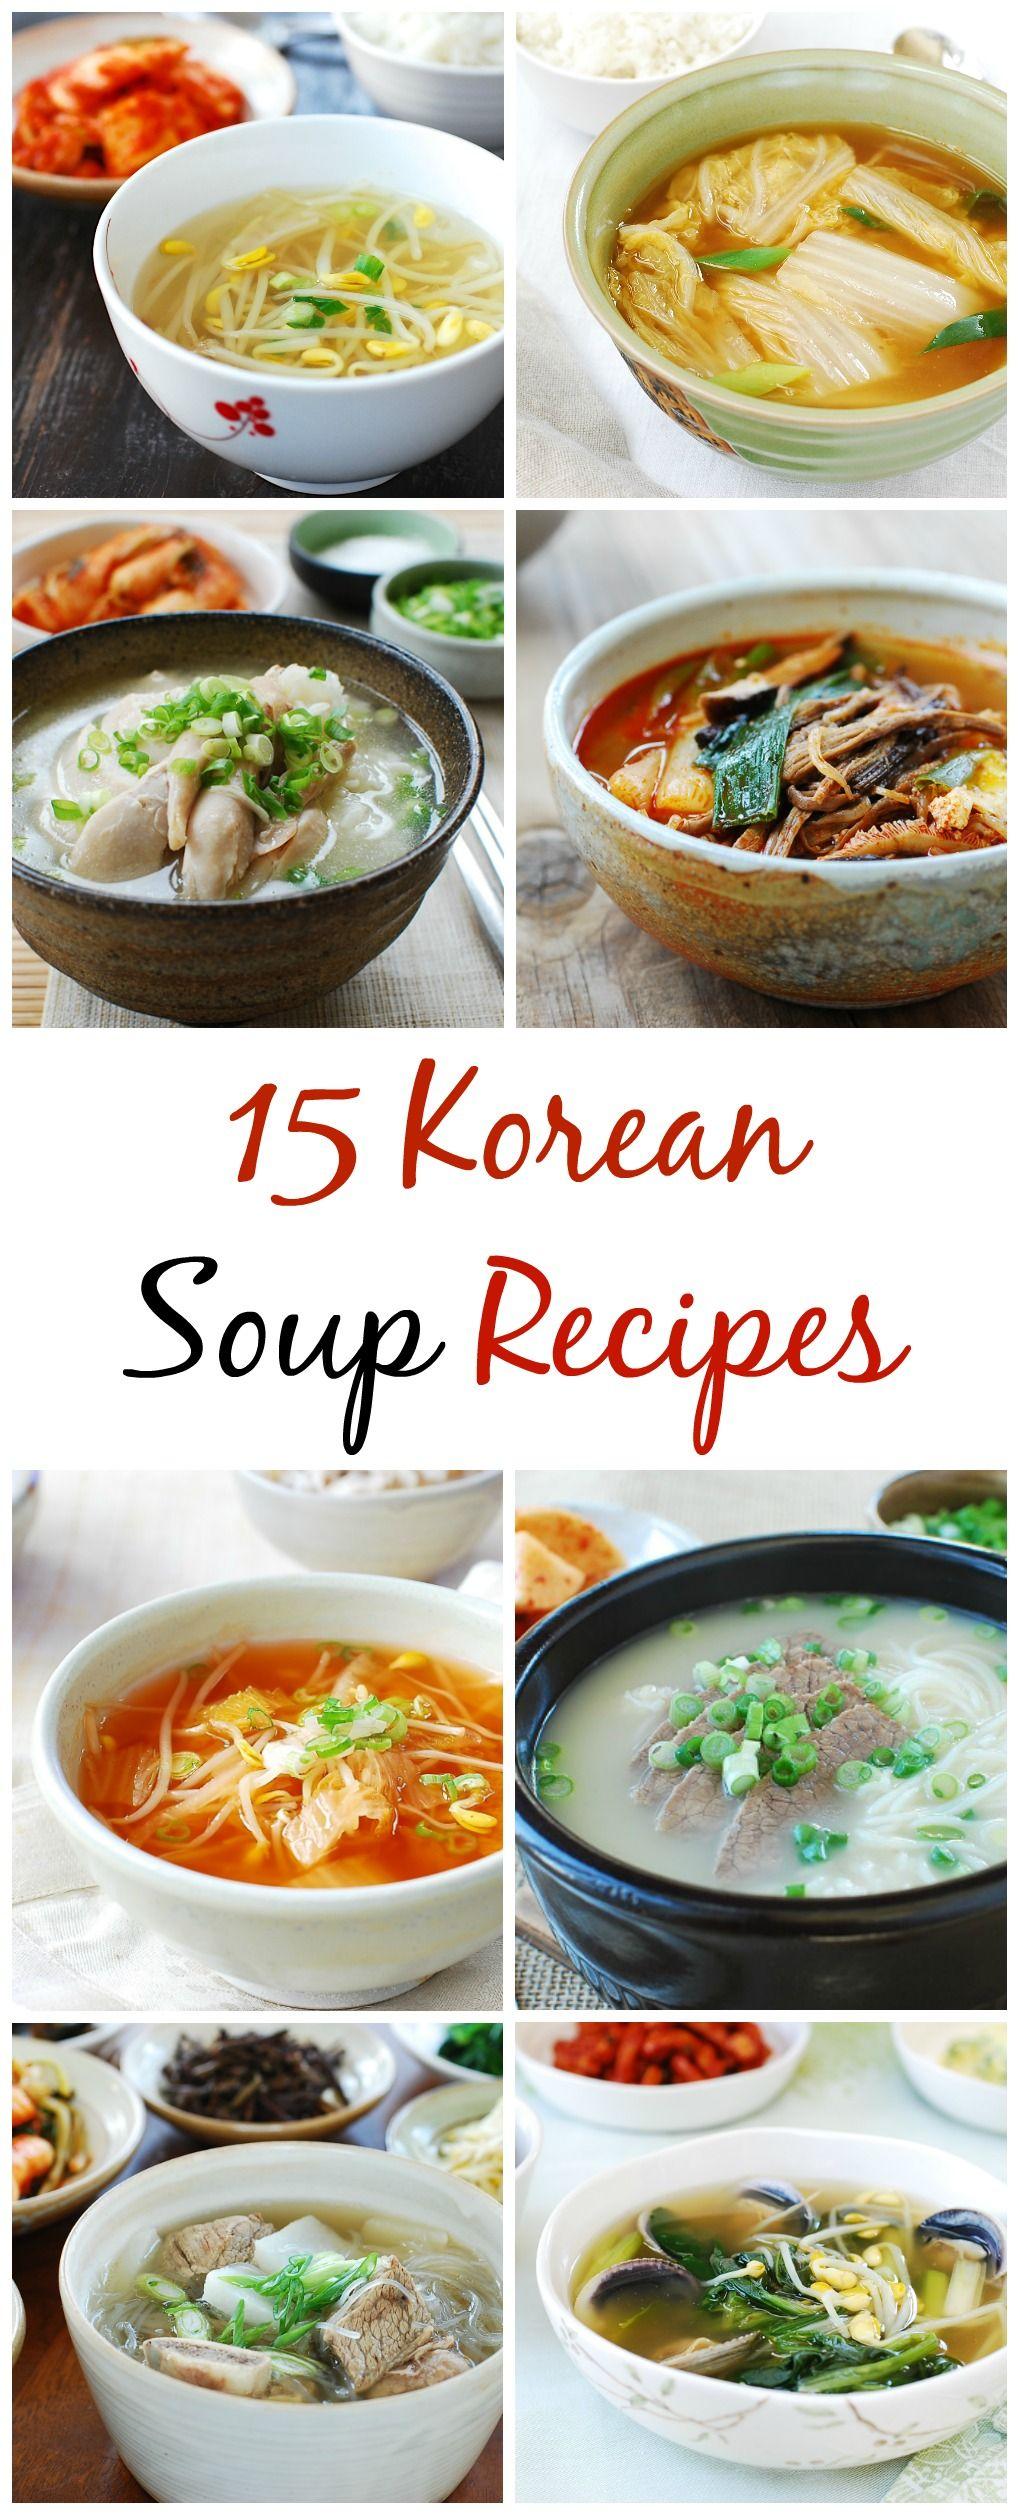 15 Korean Soup Recipes! | Korean Food | Pinterest | Comida coreana ...